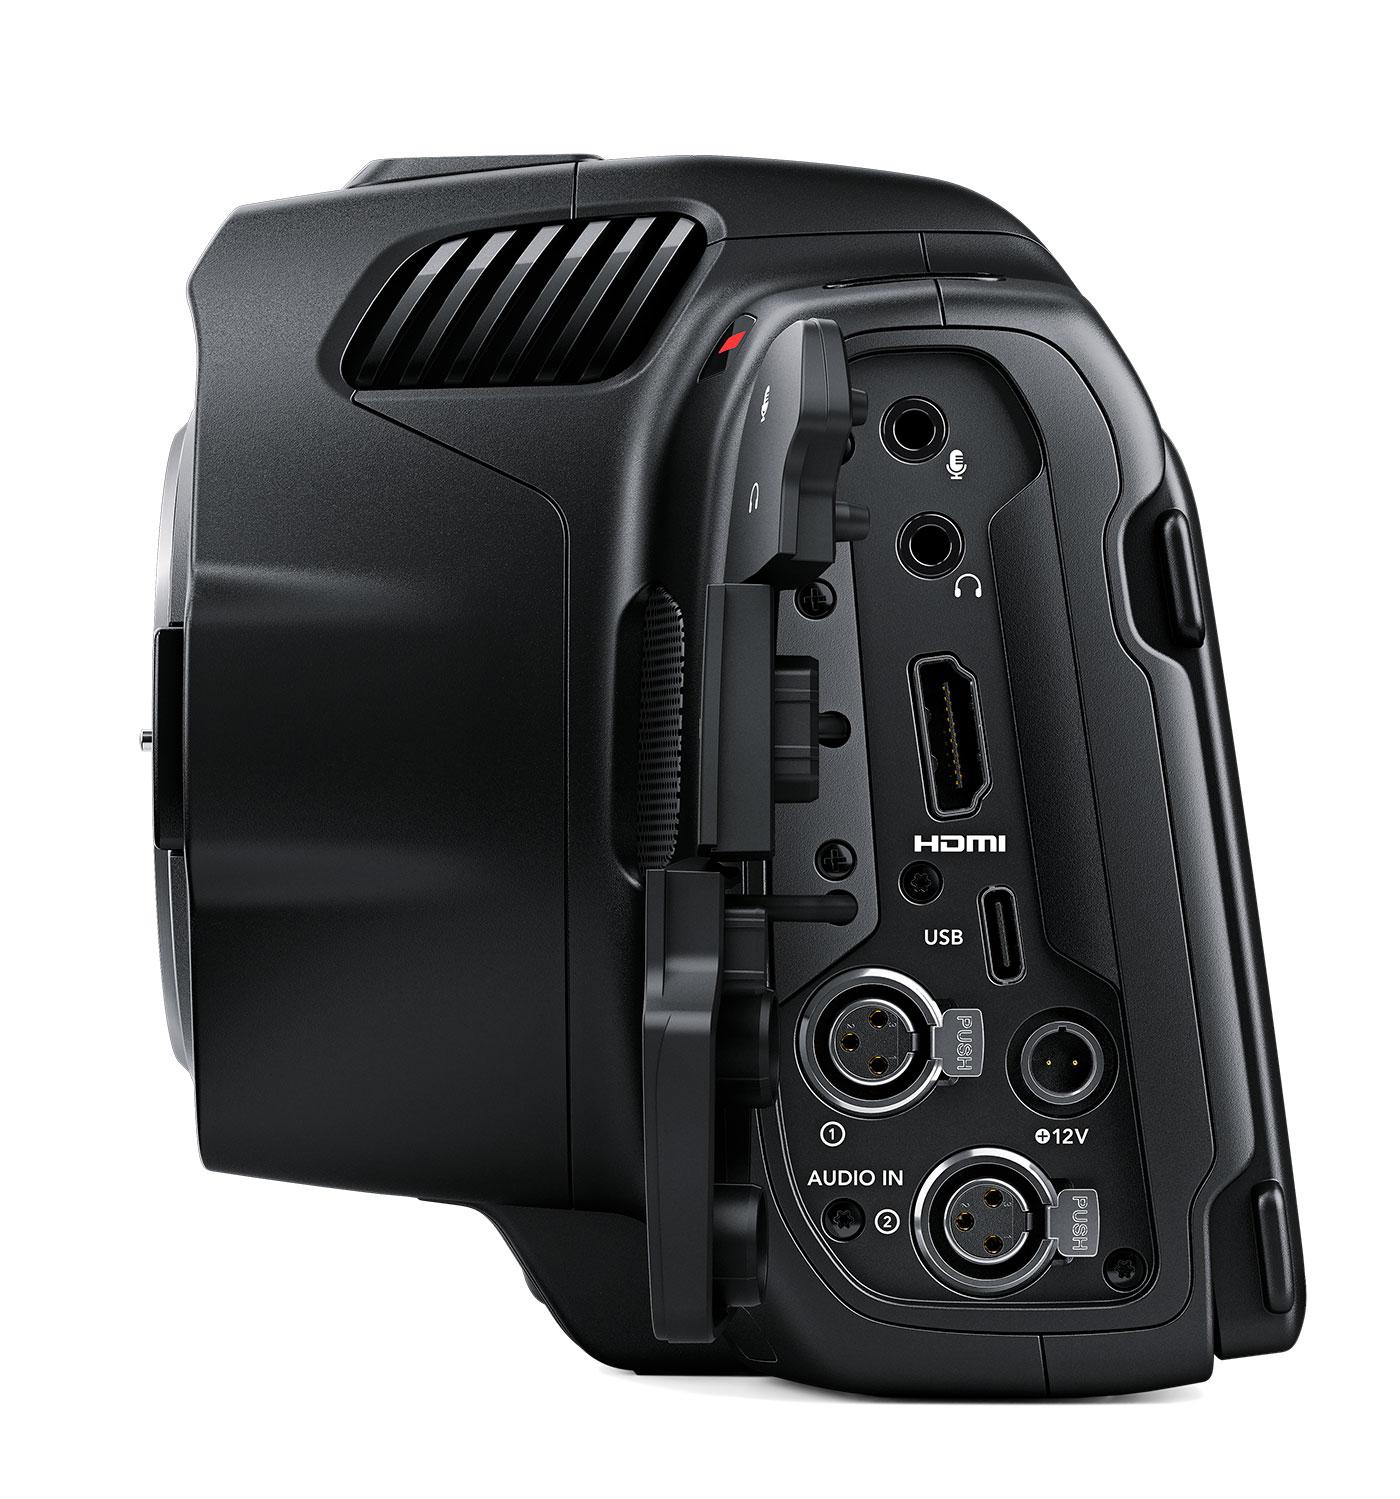 Blackmagic-Pocket-Cinema-Camera-6K-Pro-Side